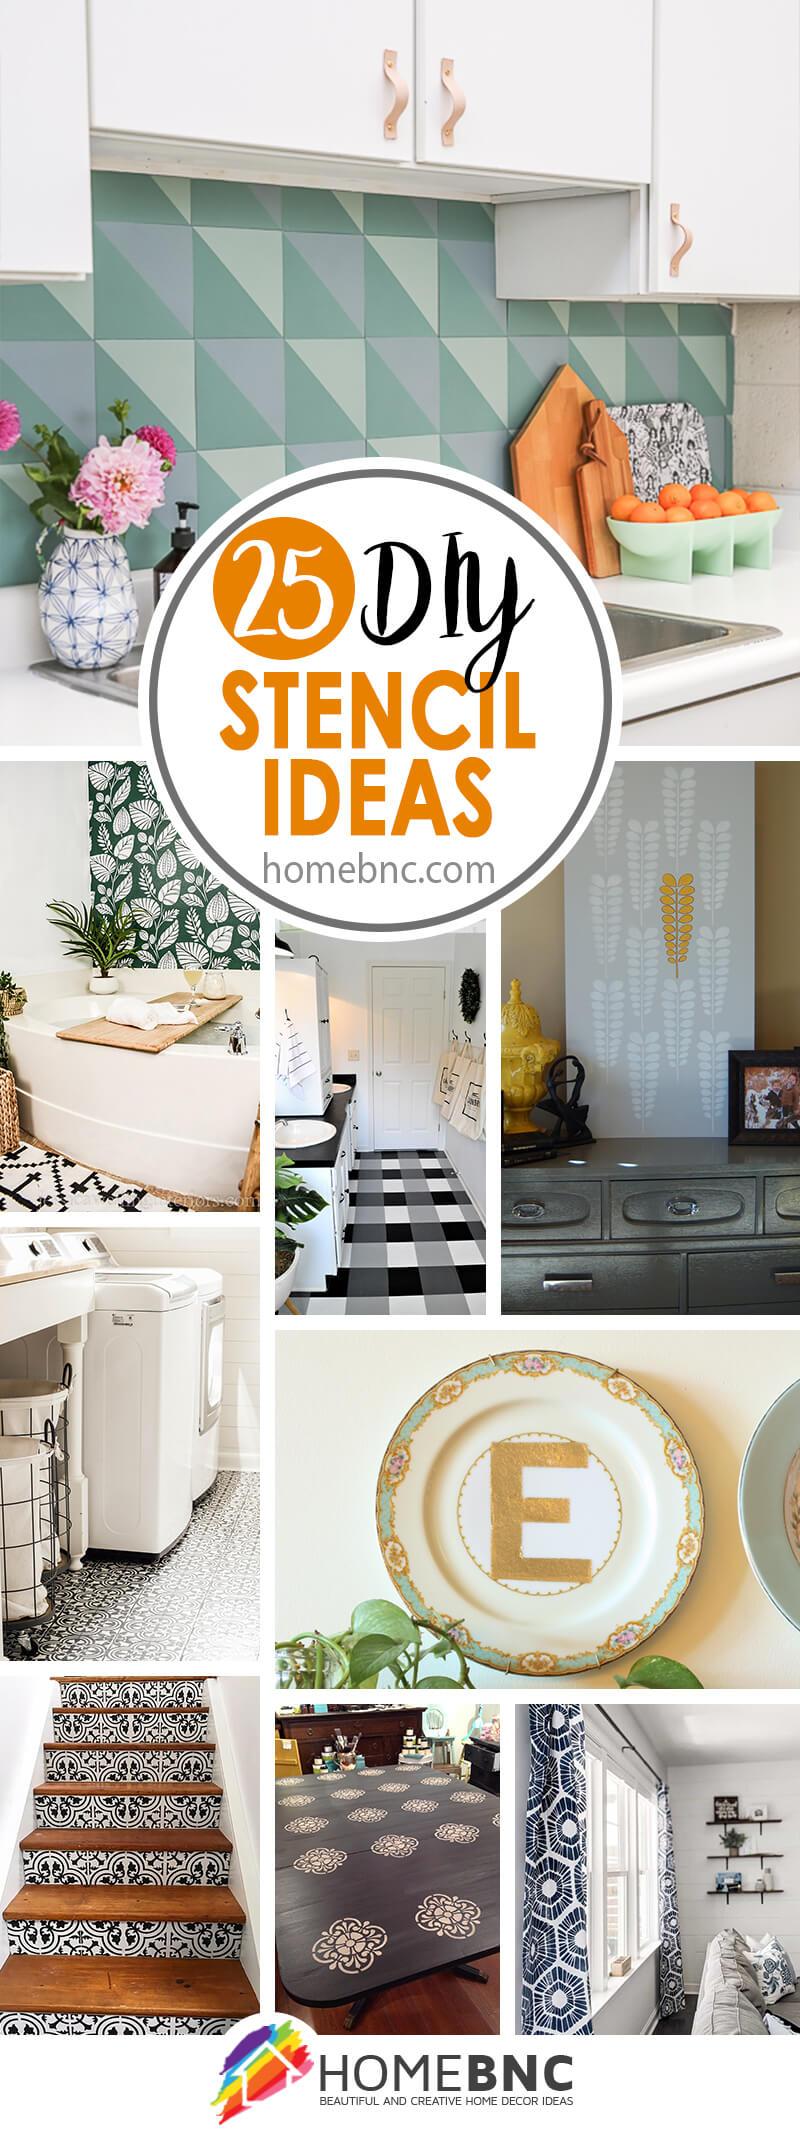 Best DIY Stencil Decor Ideas